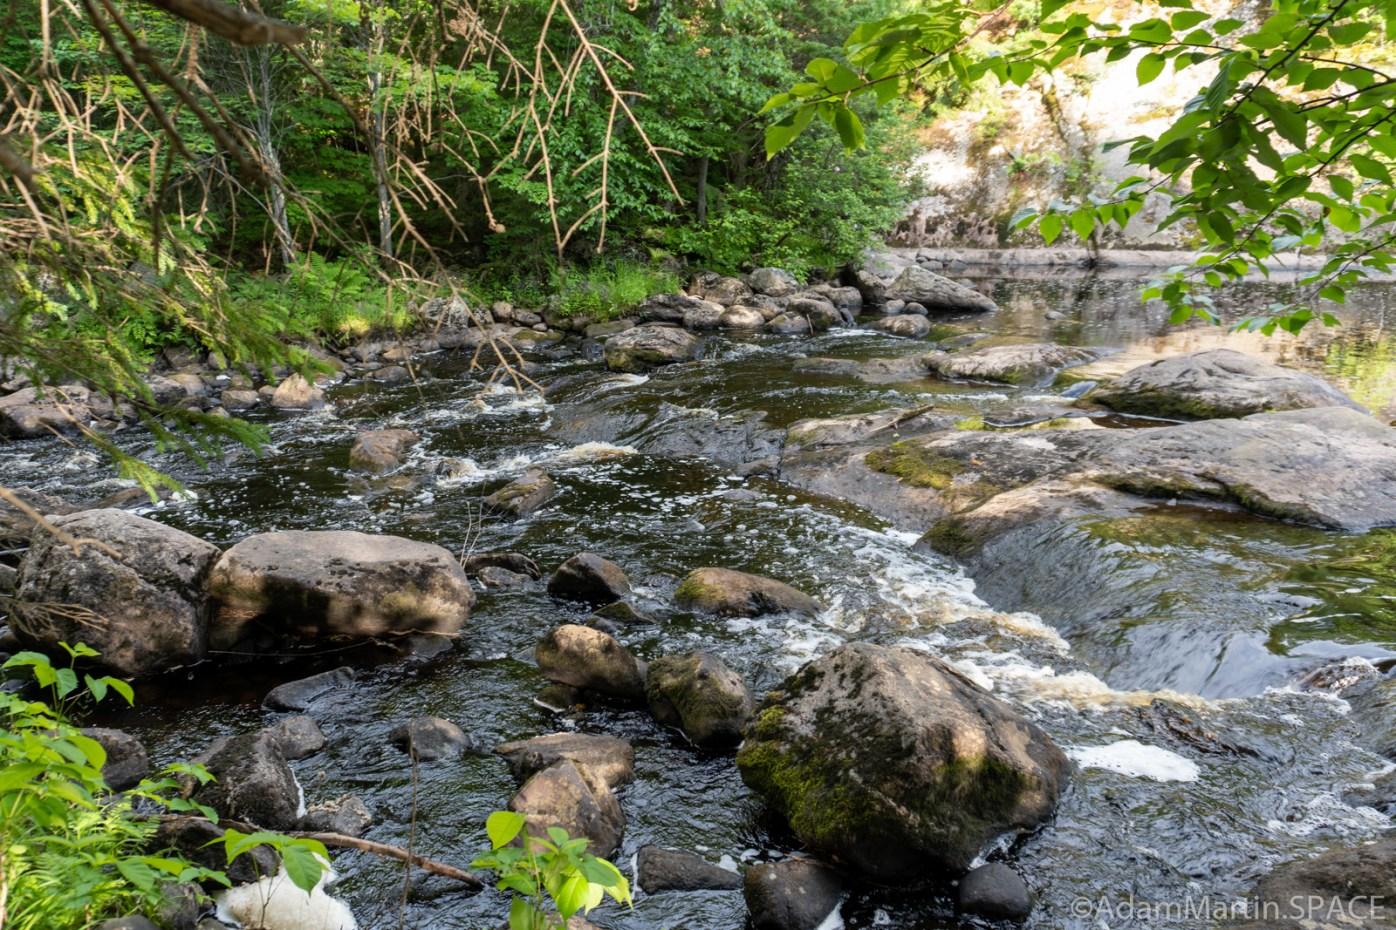 Spring Camp Falls - Small drop downstream of main falls